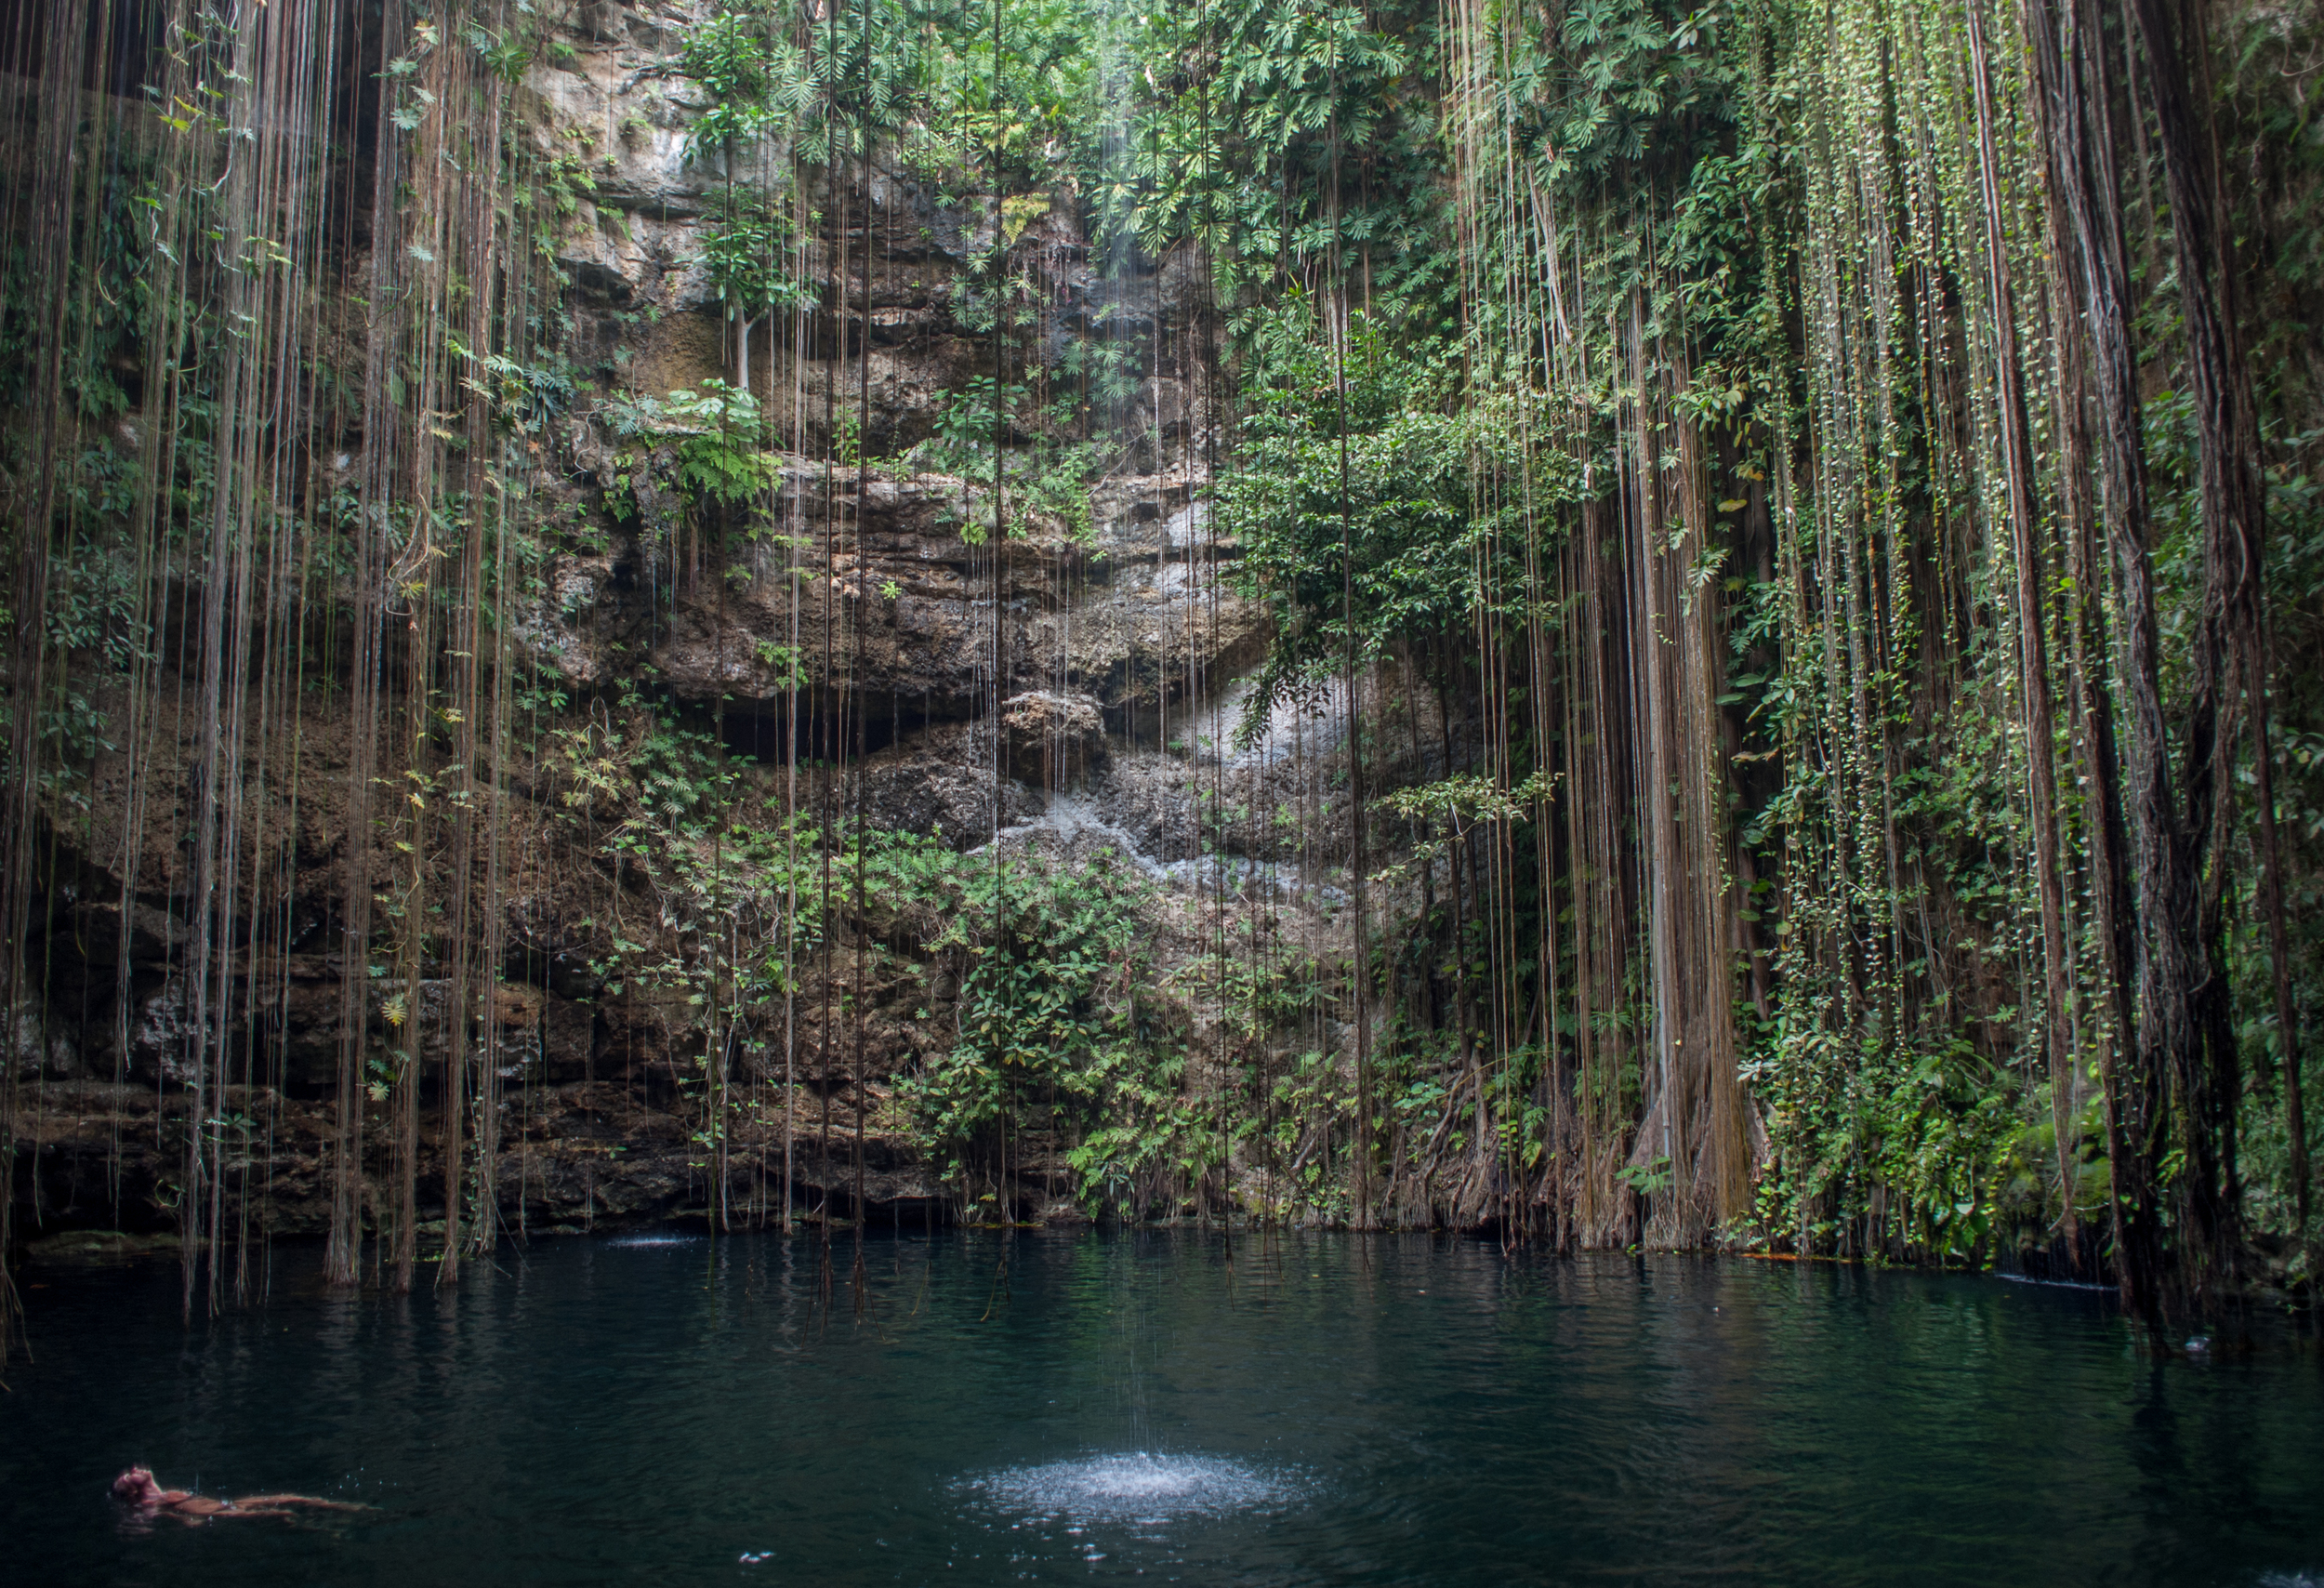 CEL_SHX_Mexico_Cenote Ik Kil near Chichen Itza.jpg